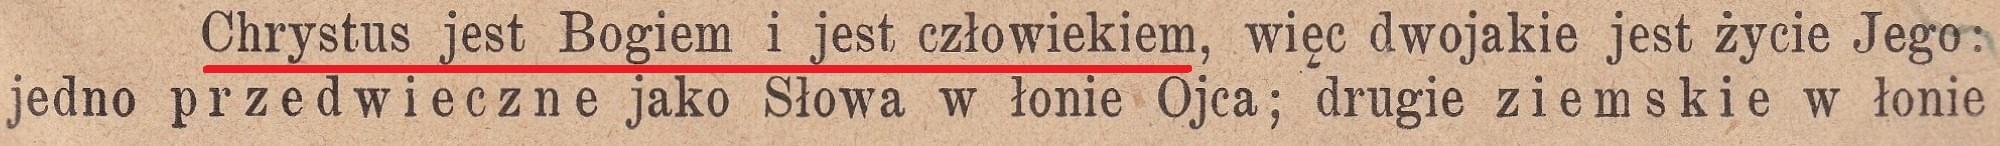 Historia Biblijna wyd.1896 r.